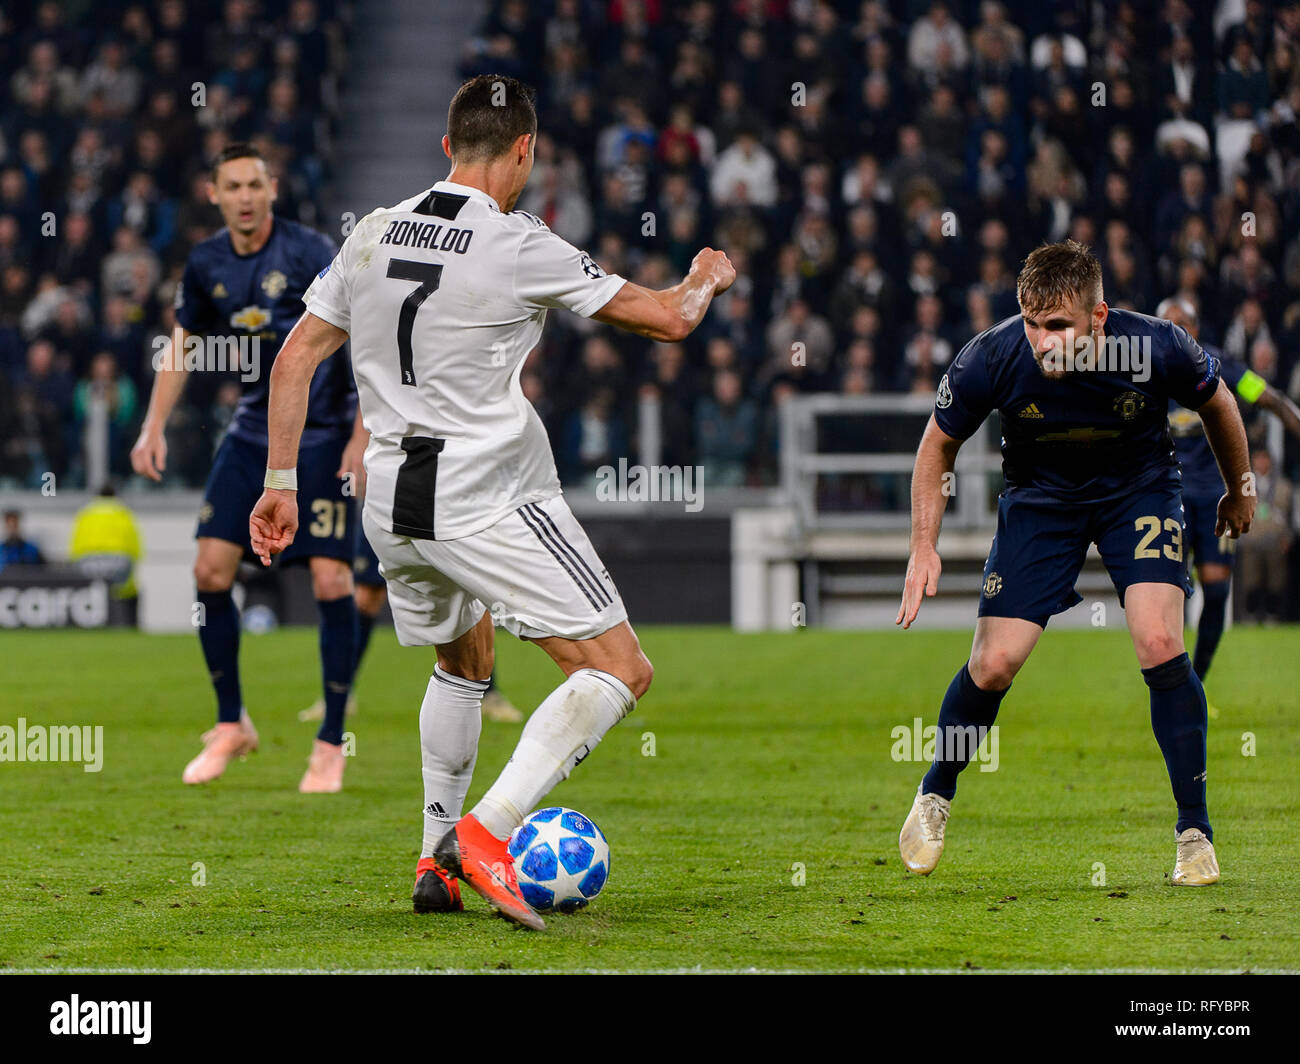 Turin - Nov 7, 2018:  Cristiano Ronaldo 7 shows his ball possession technic. Juventus - Manchester United. UEFA Champions League. Matchday 4. Allianz  - Stock Image